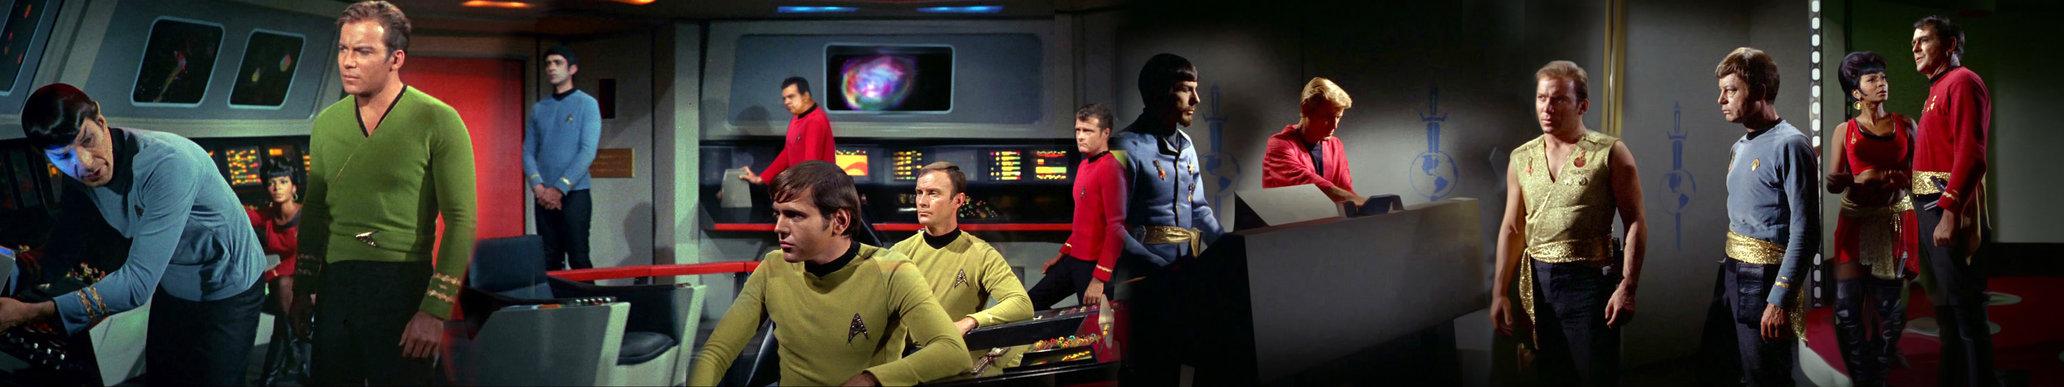 Star Trek desktop background wallpaper 5760x1080 by Mecandes on 2064x387